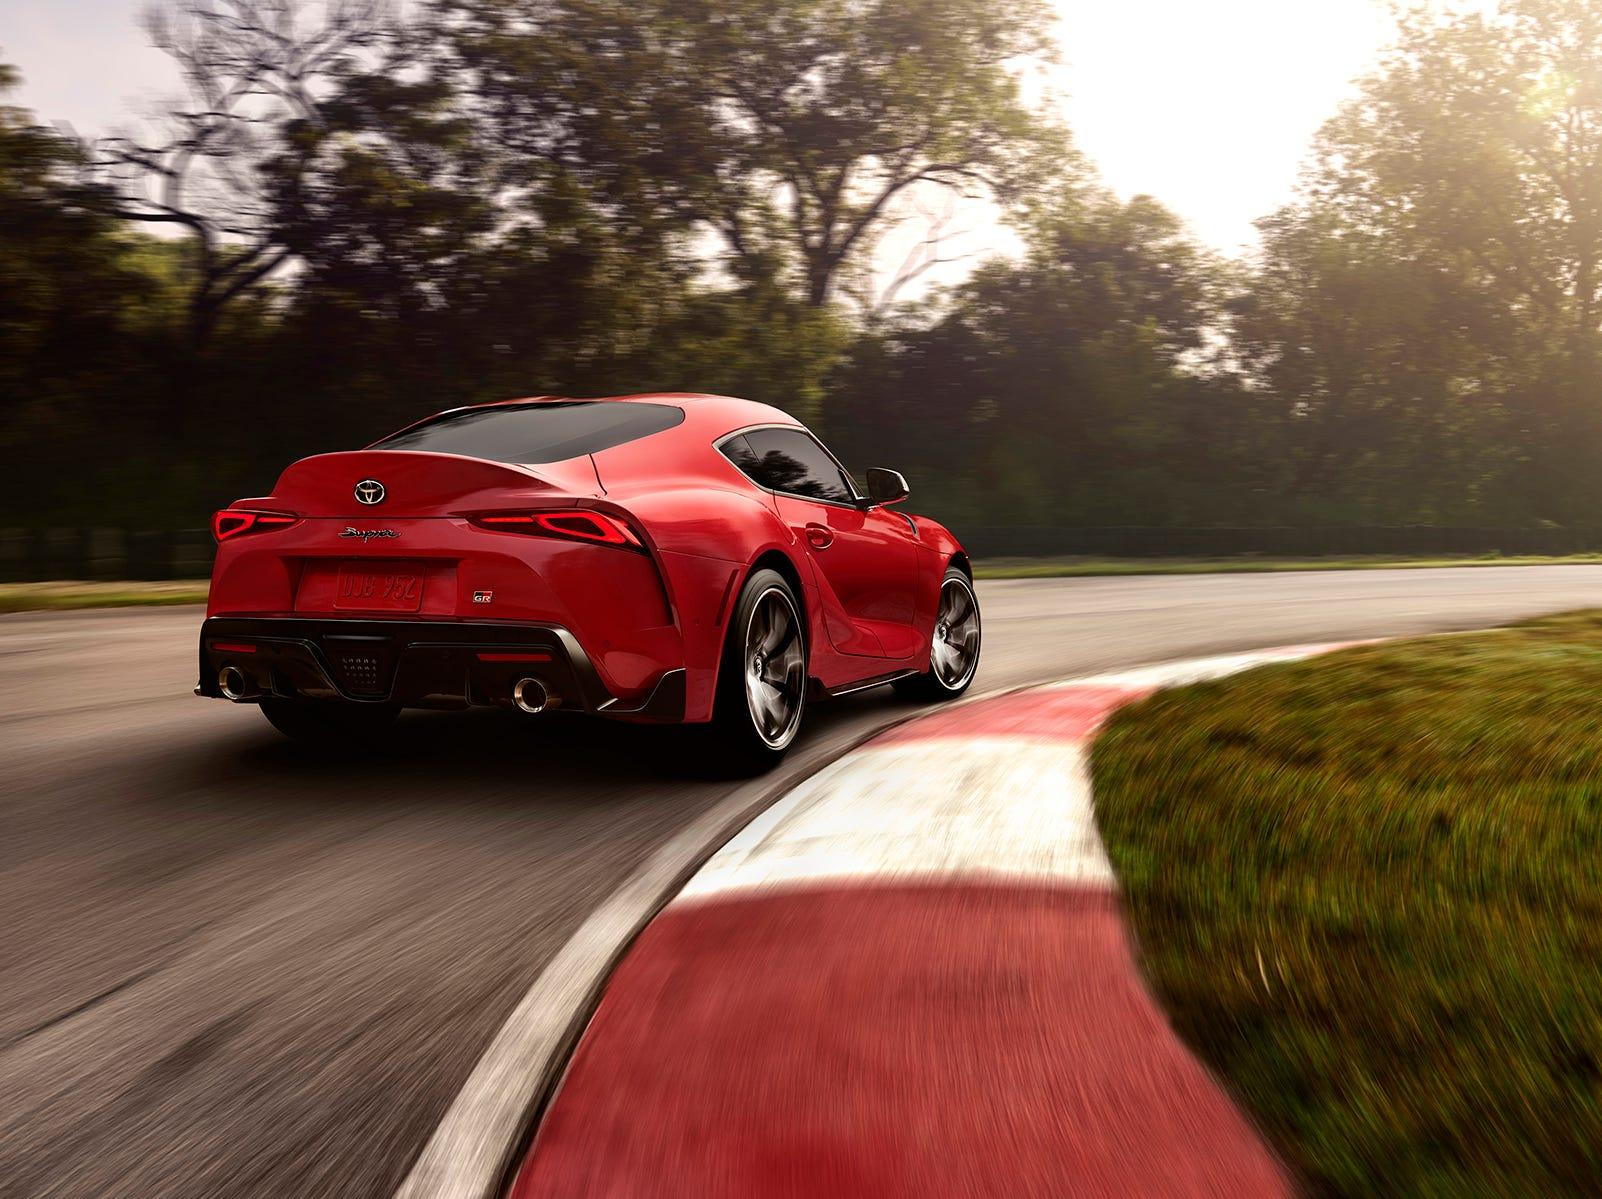 The 2020 Toyota Supra